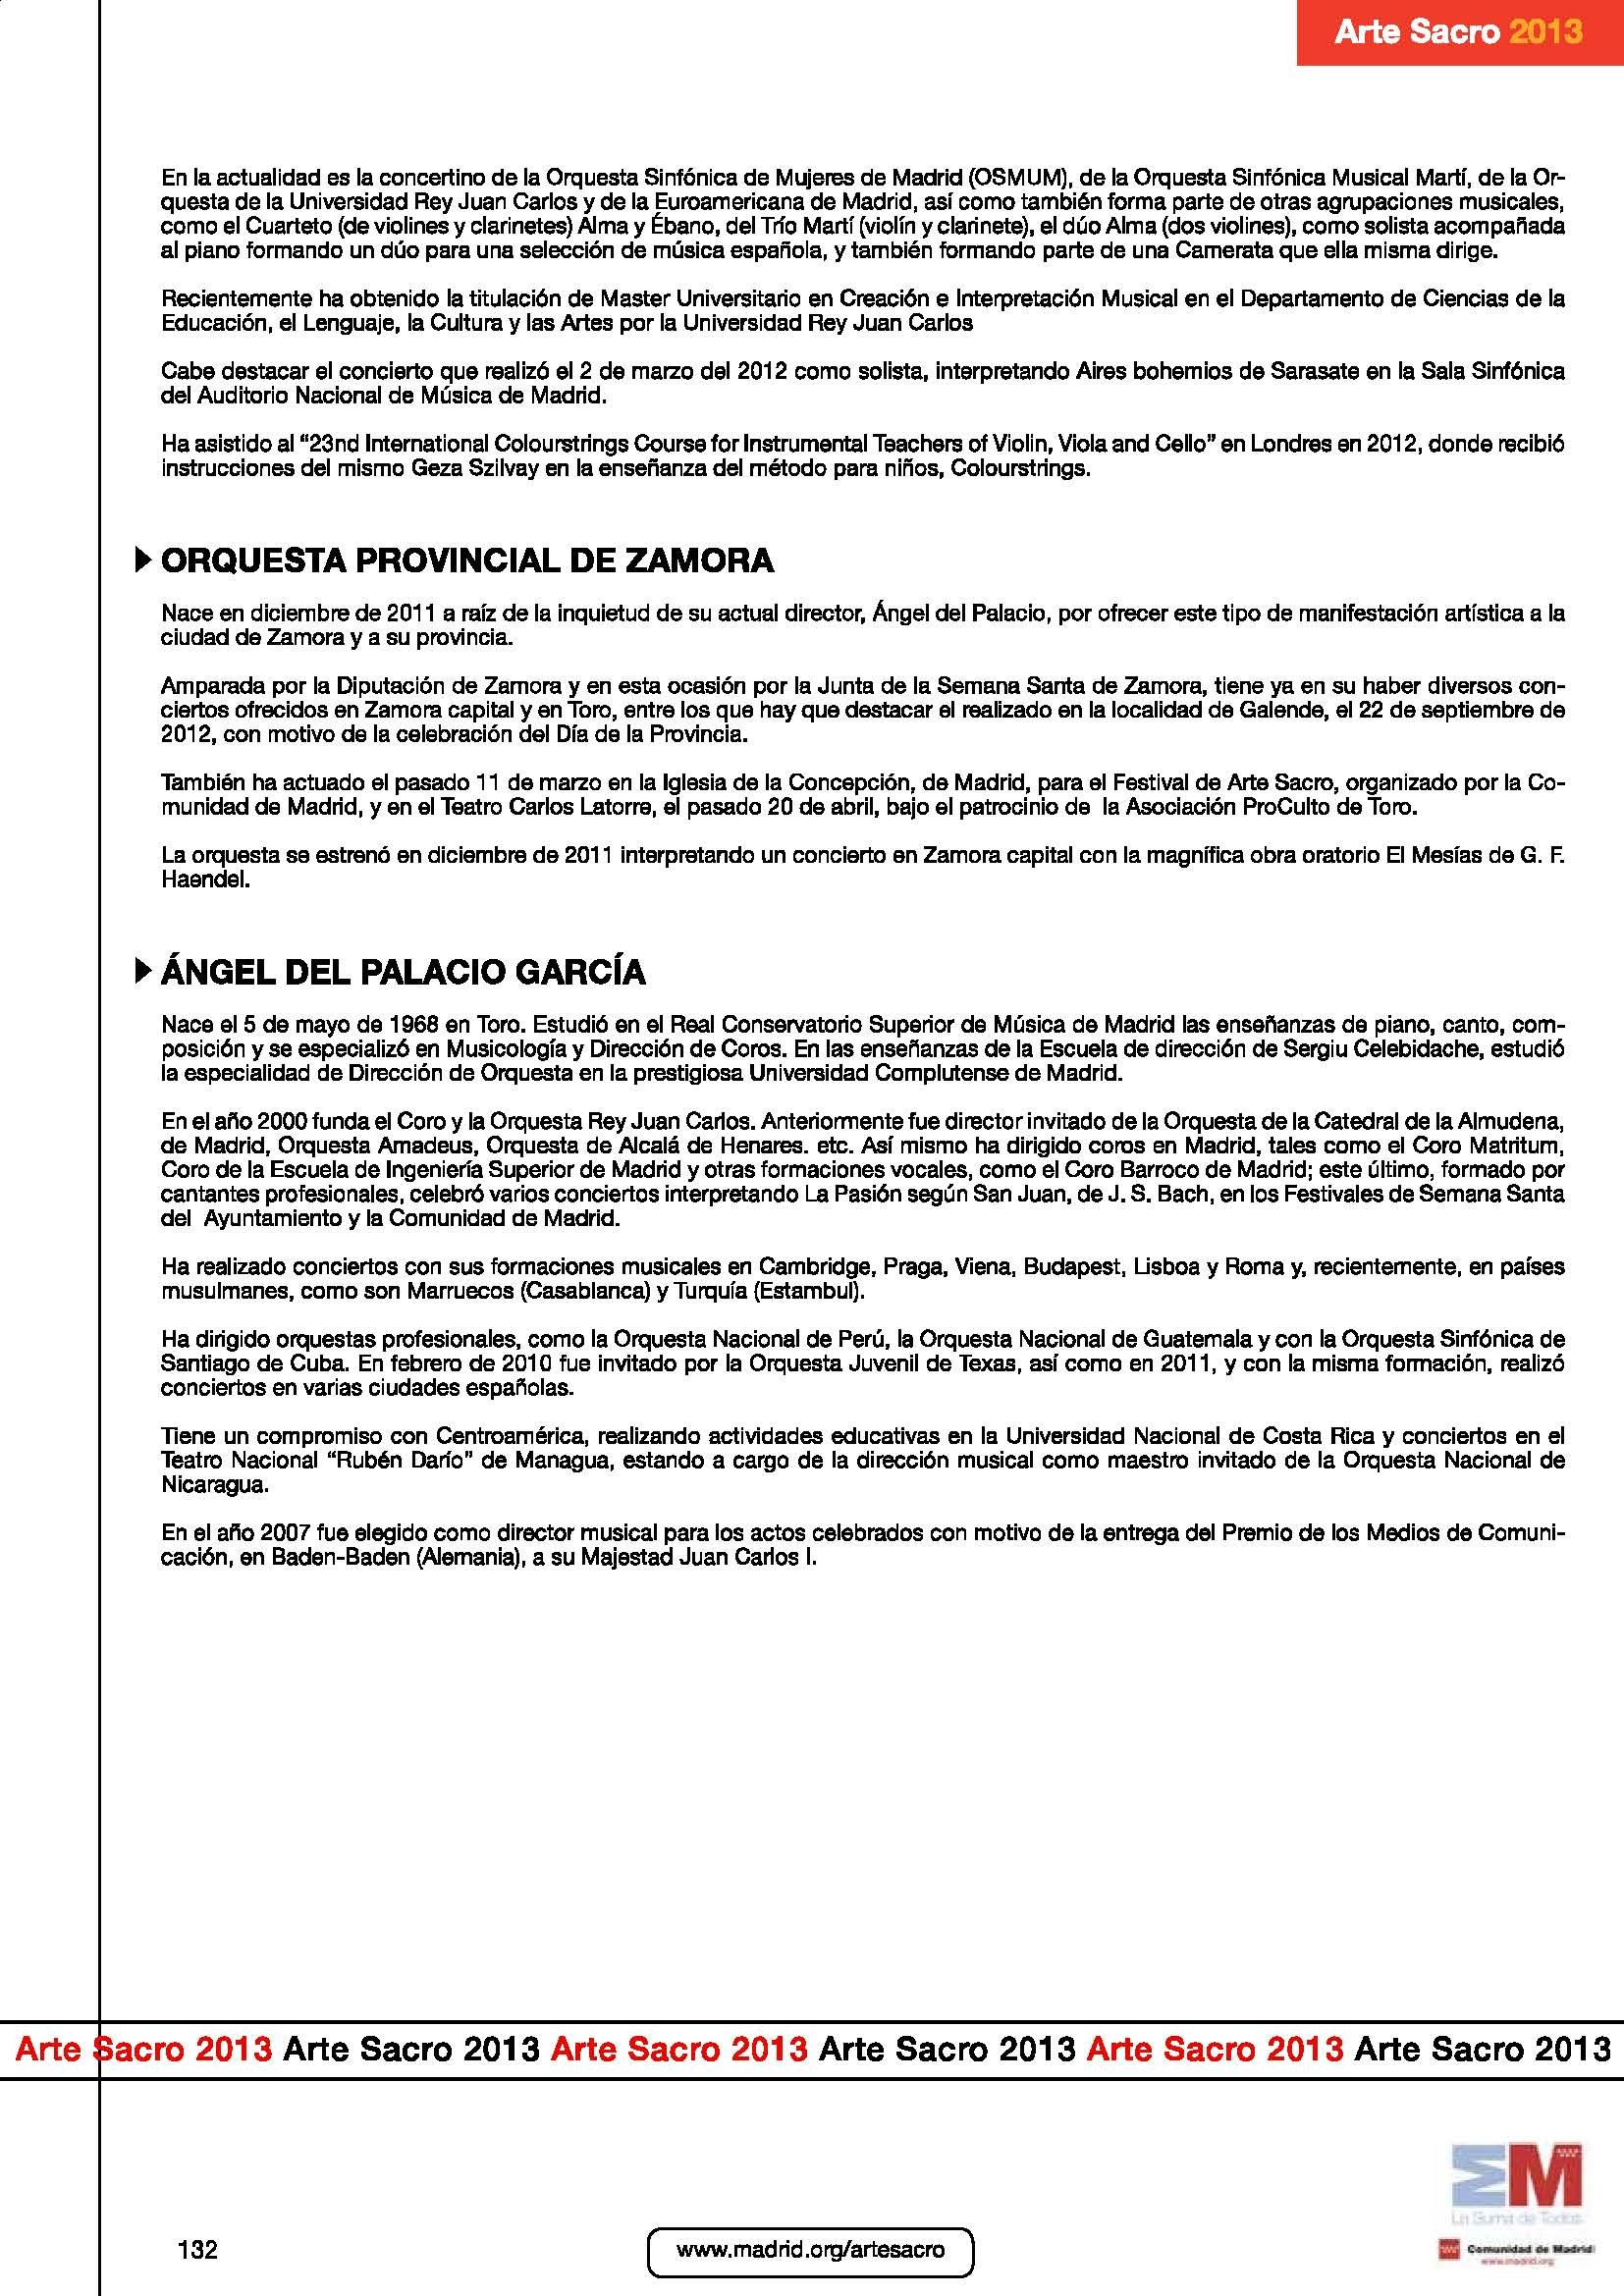 dossier_completo_Página_132